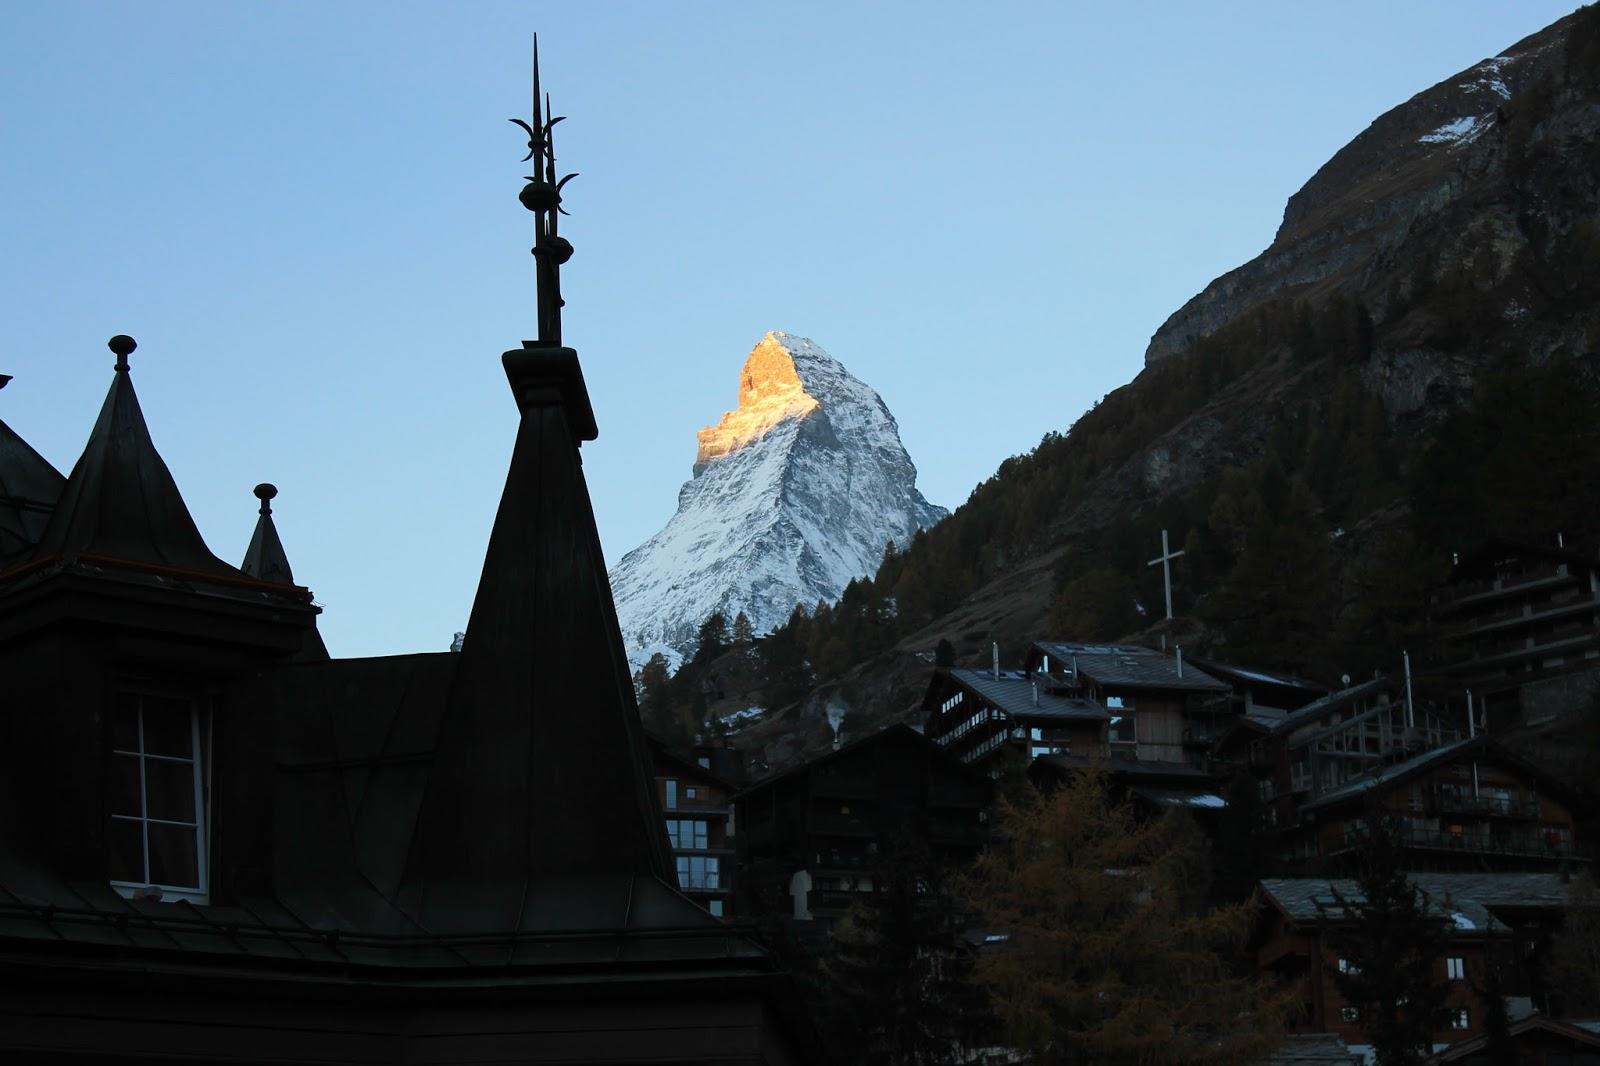 Nascer do Sol na Montanha Matterhon - Zermatt